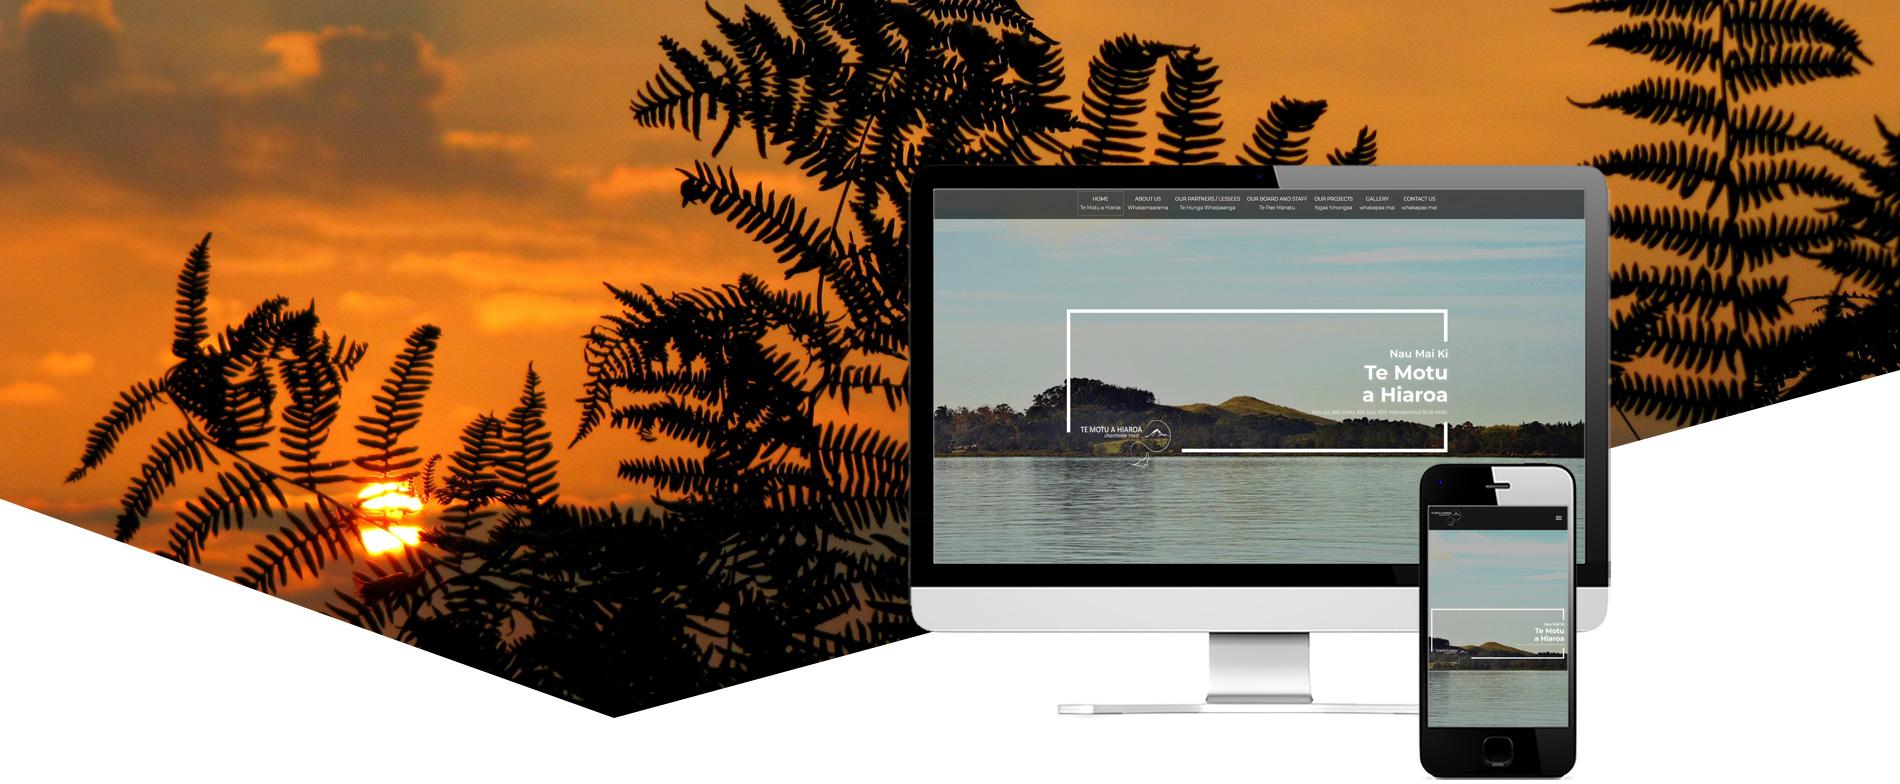 Te Motu A Hiaroa Project Banner - Te Motu a Hiaroa Website Design